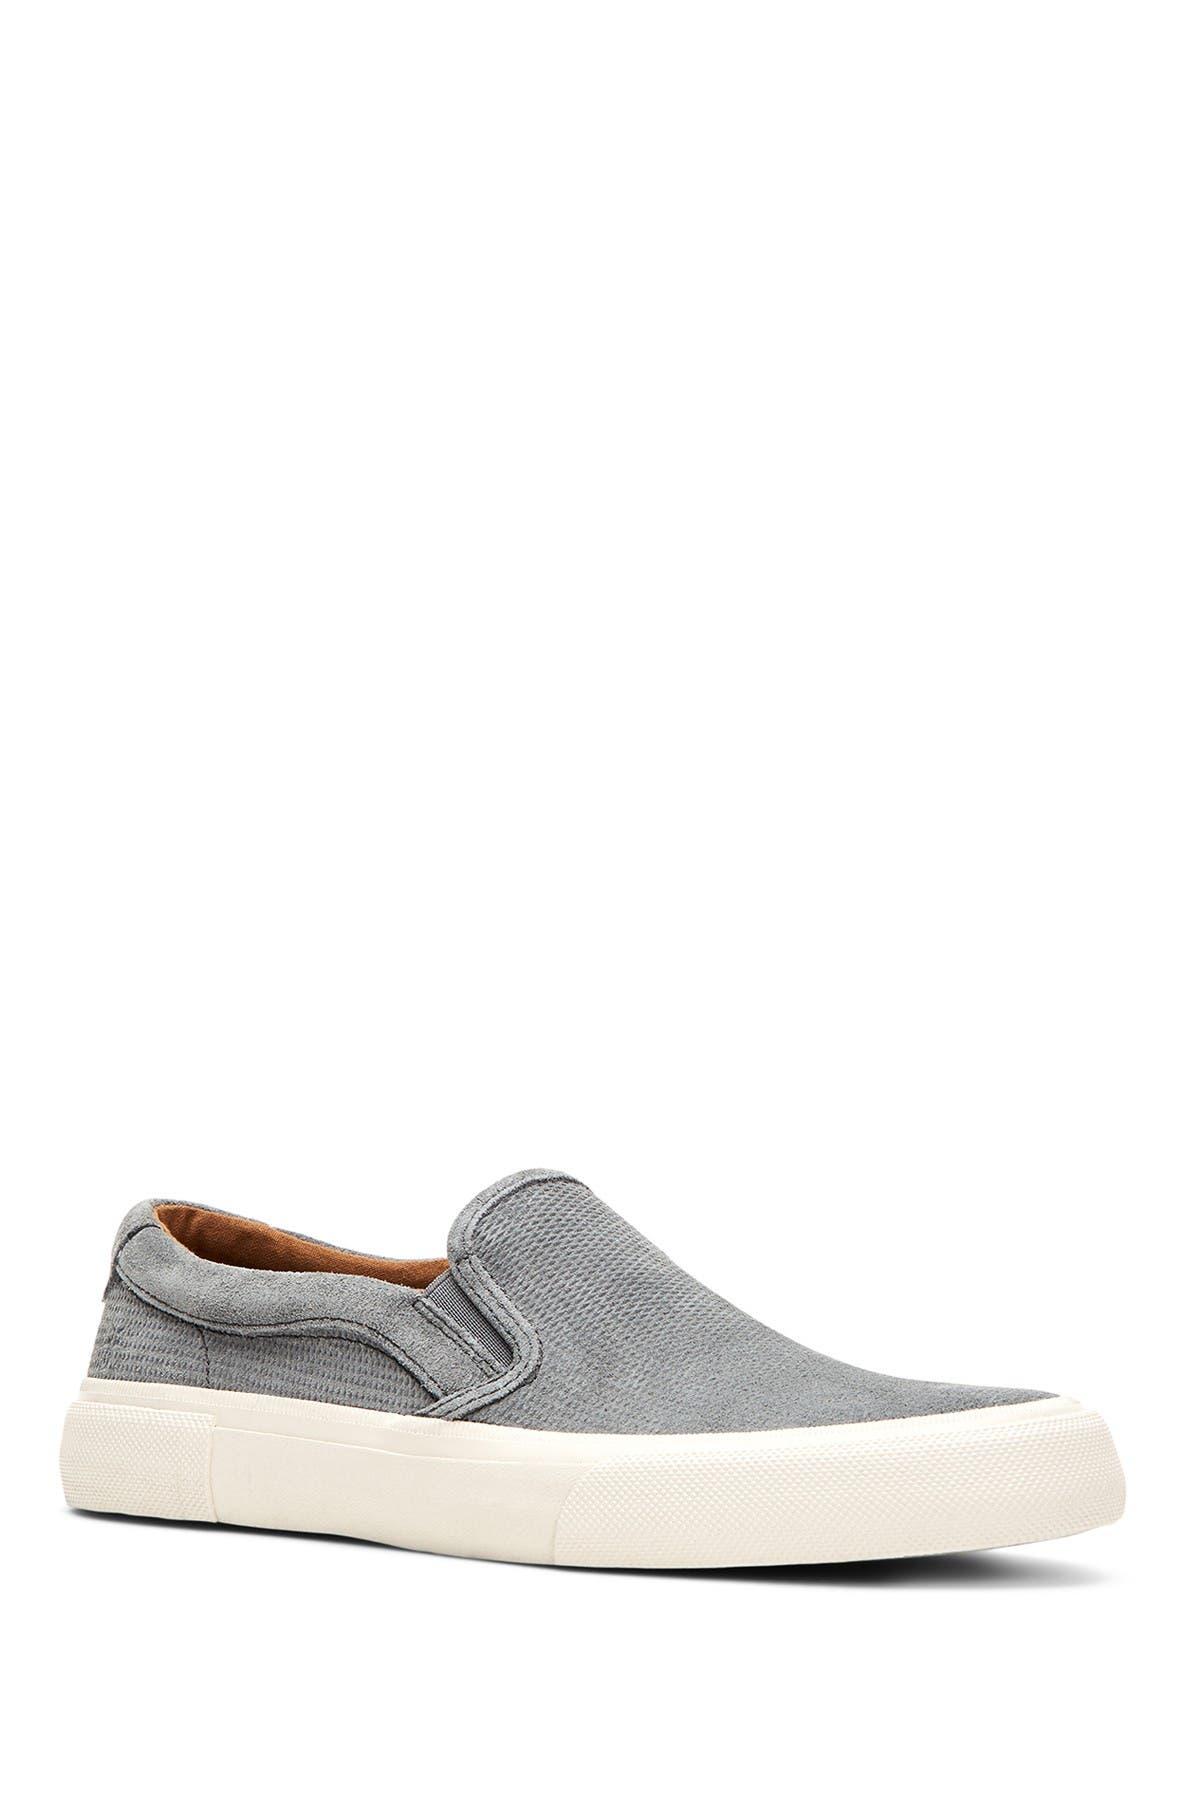 Image of Frye Ludlow Slip-On Suede Sneaker